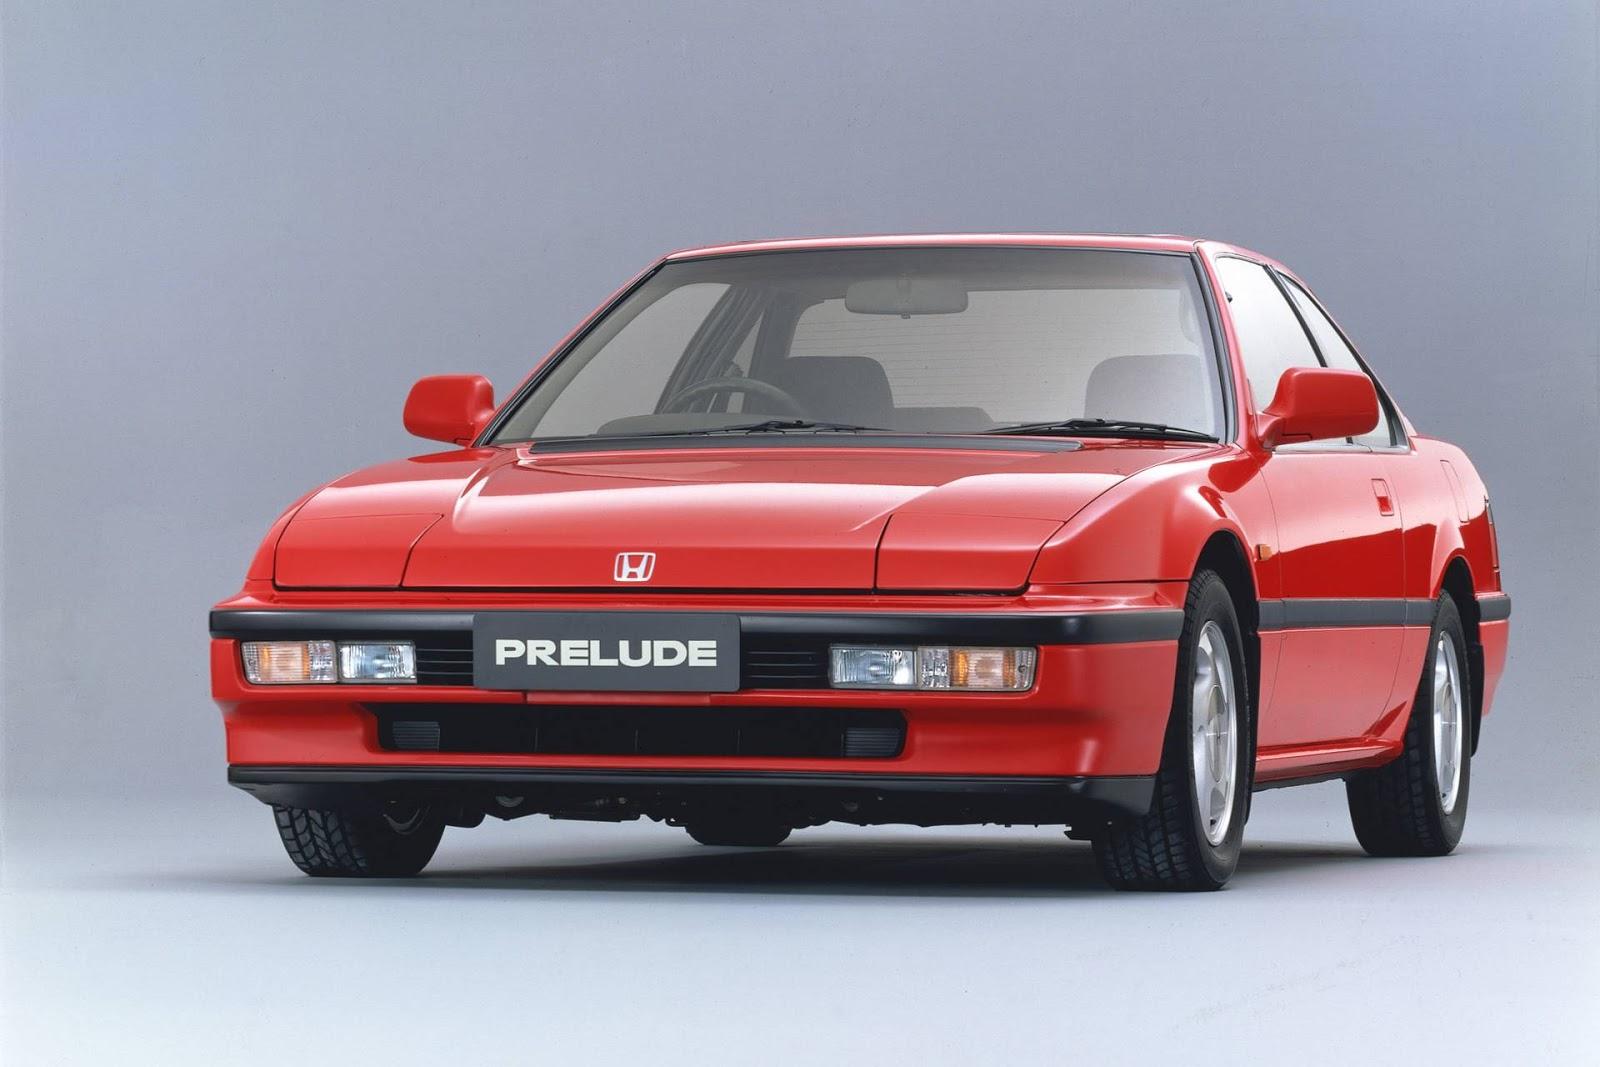 honda prelude 2 Φέρτε πίσω τα pop ups: 12 πάμφθηνα αυτοκίνητα που τα χουν Fiat X1/9, Honda, Lotus, mazda mx-5, Mazda RX-7, Mitsubishi 3000GT, Nissan 200SX, pop ups, Porsche, Toyota, Toyota AE86, Toyota MR2, zblog, μεταχειρισμένα, φανάρια ανακλινόμενα